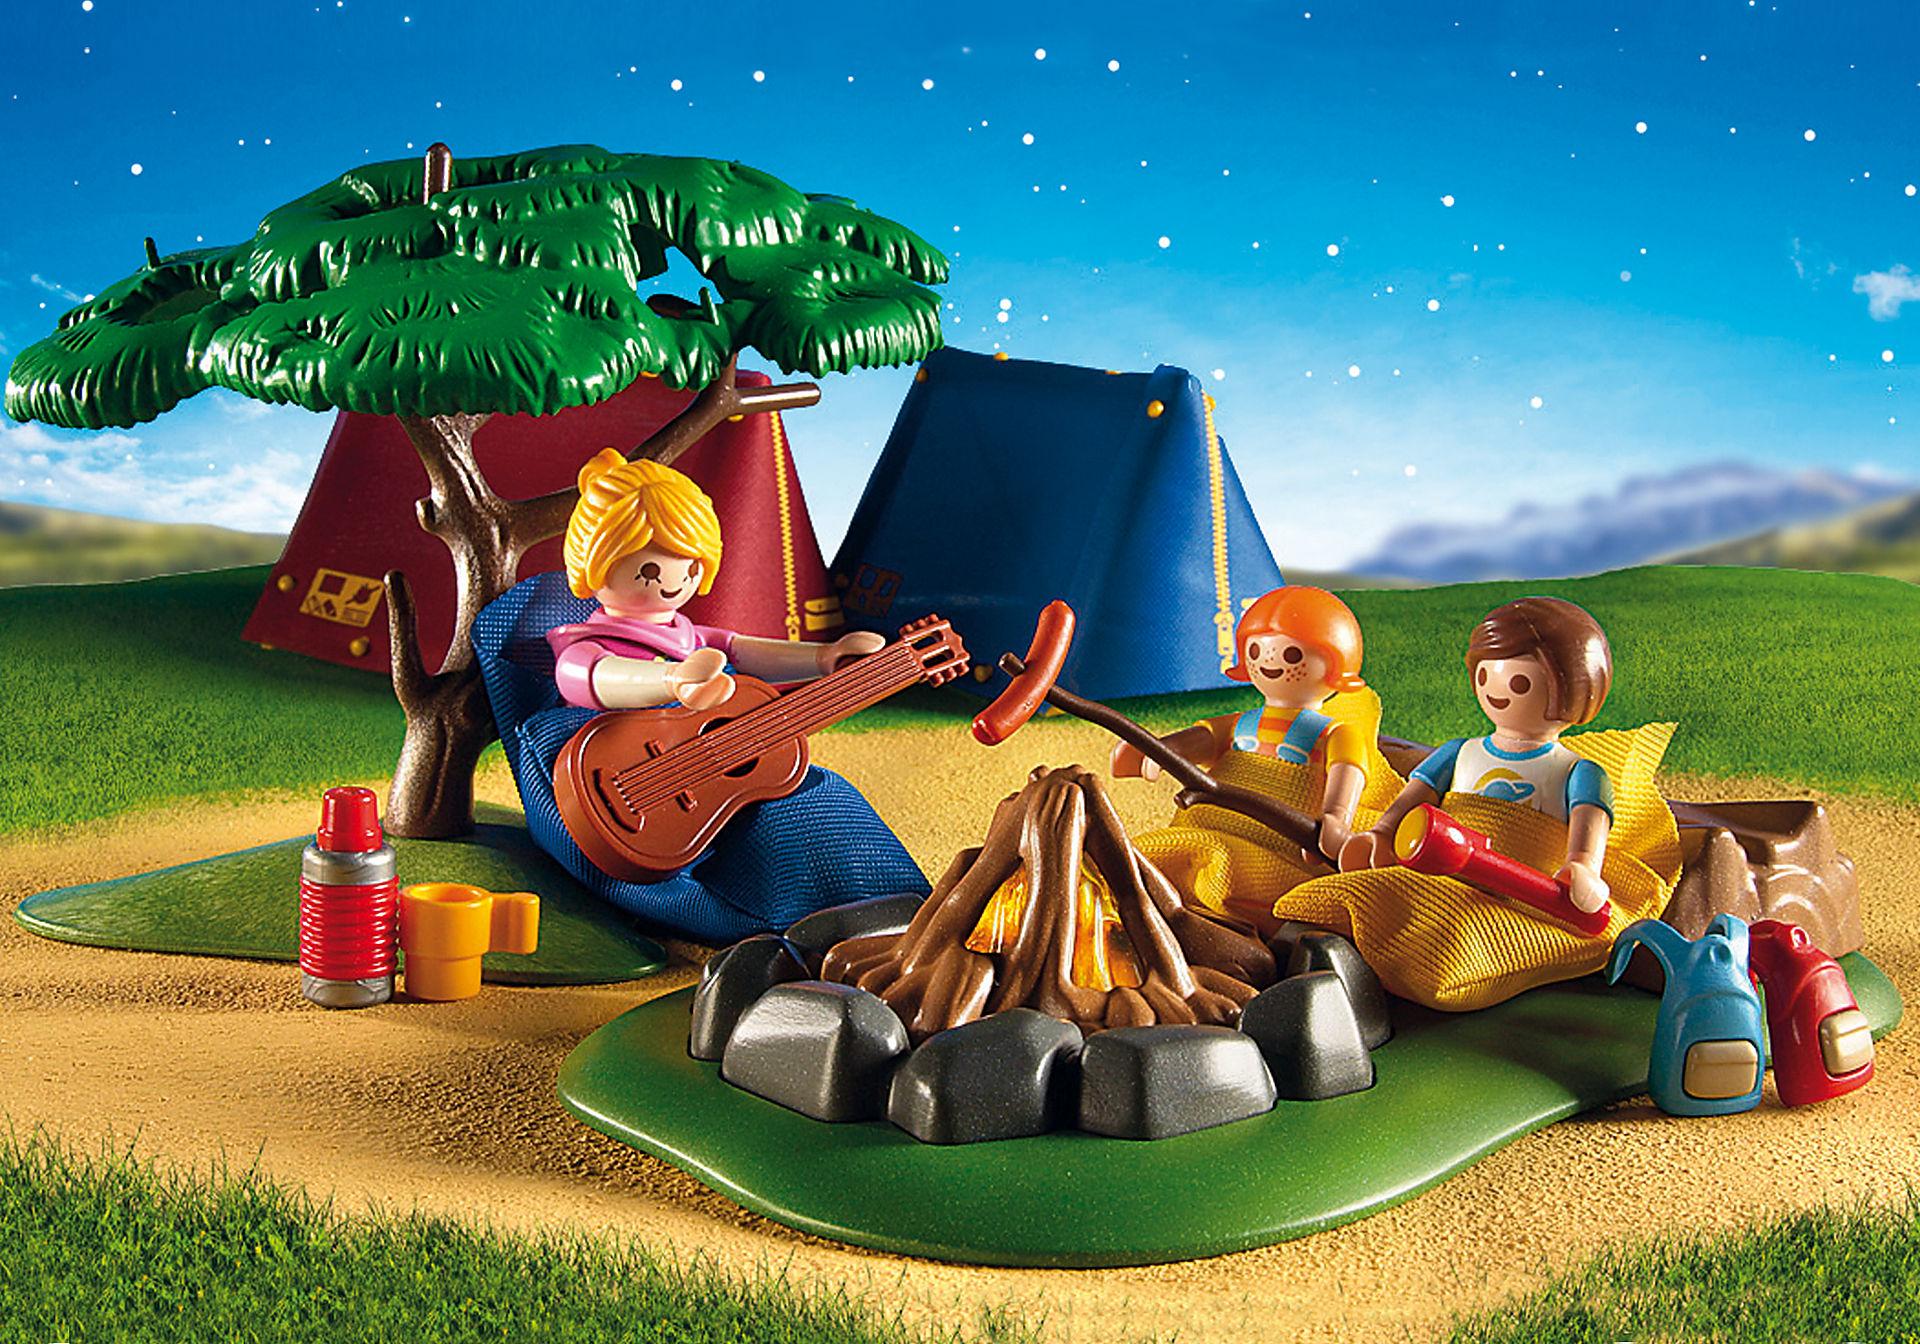 http://media.playmobil.com/i/playmobil/6888_product_extra1/Tentes avec enfants et animatrice